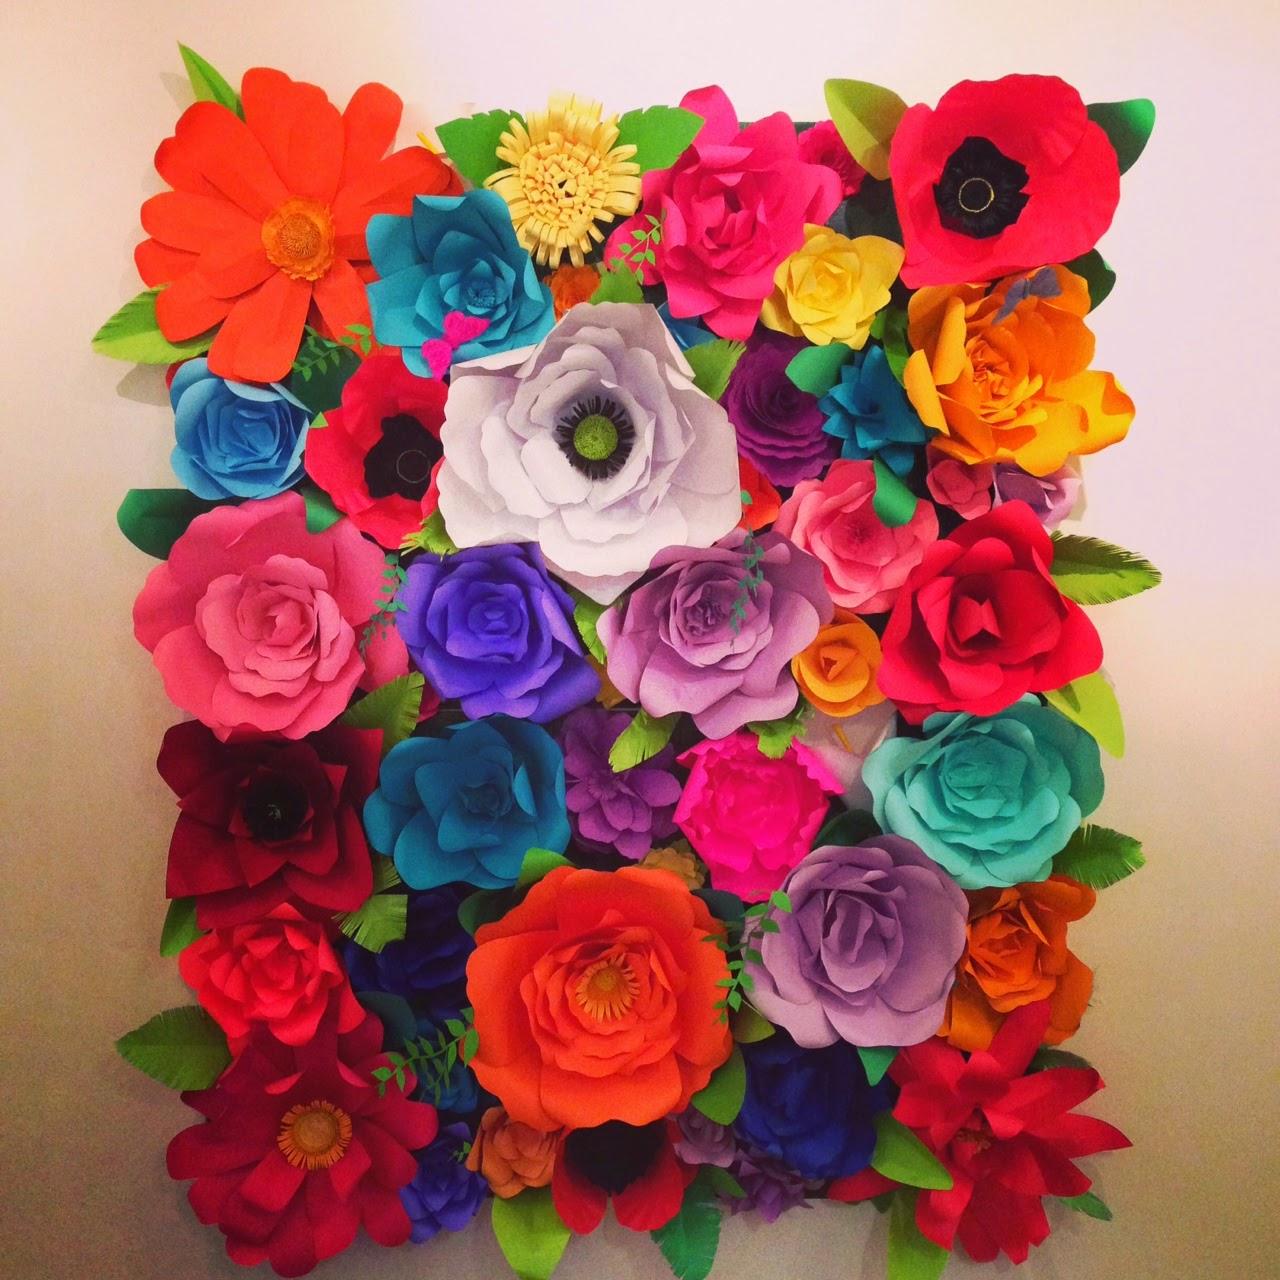 Artelexia: Giant Paper Flower Workshop